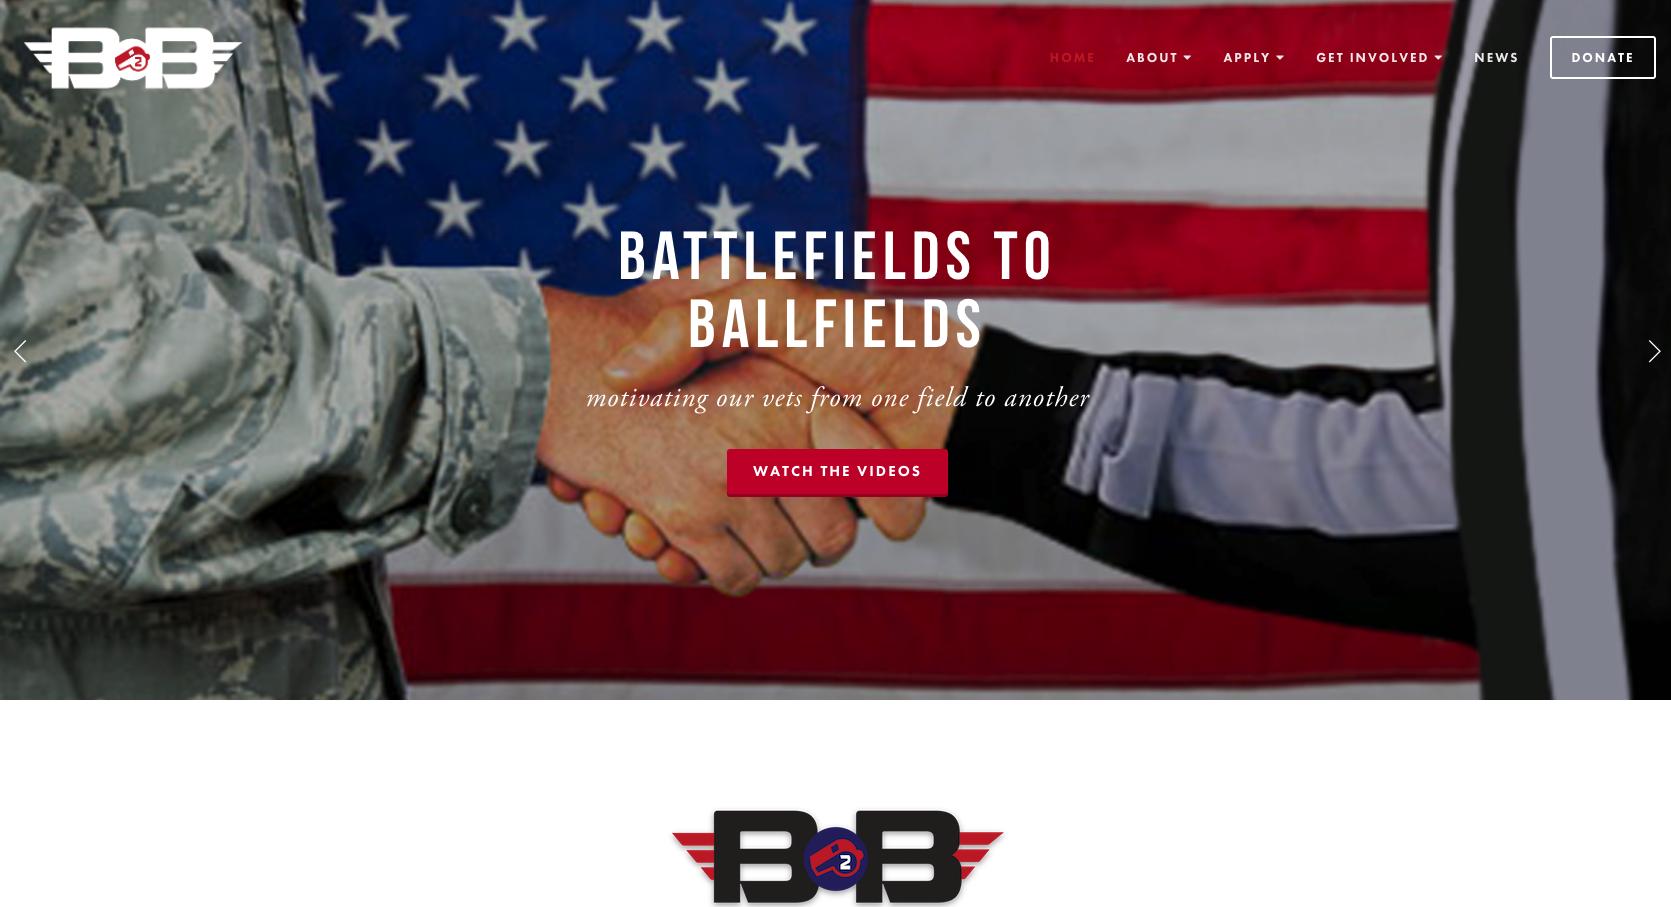 Battlefields to Ballfields - Site Setup & Customization, Image Curation